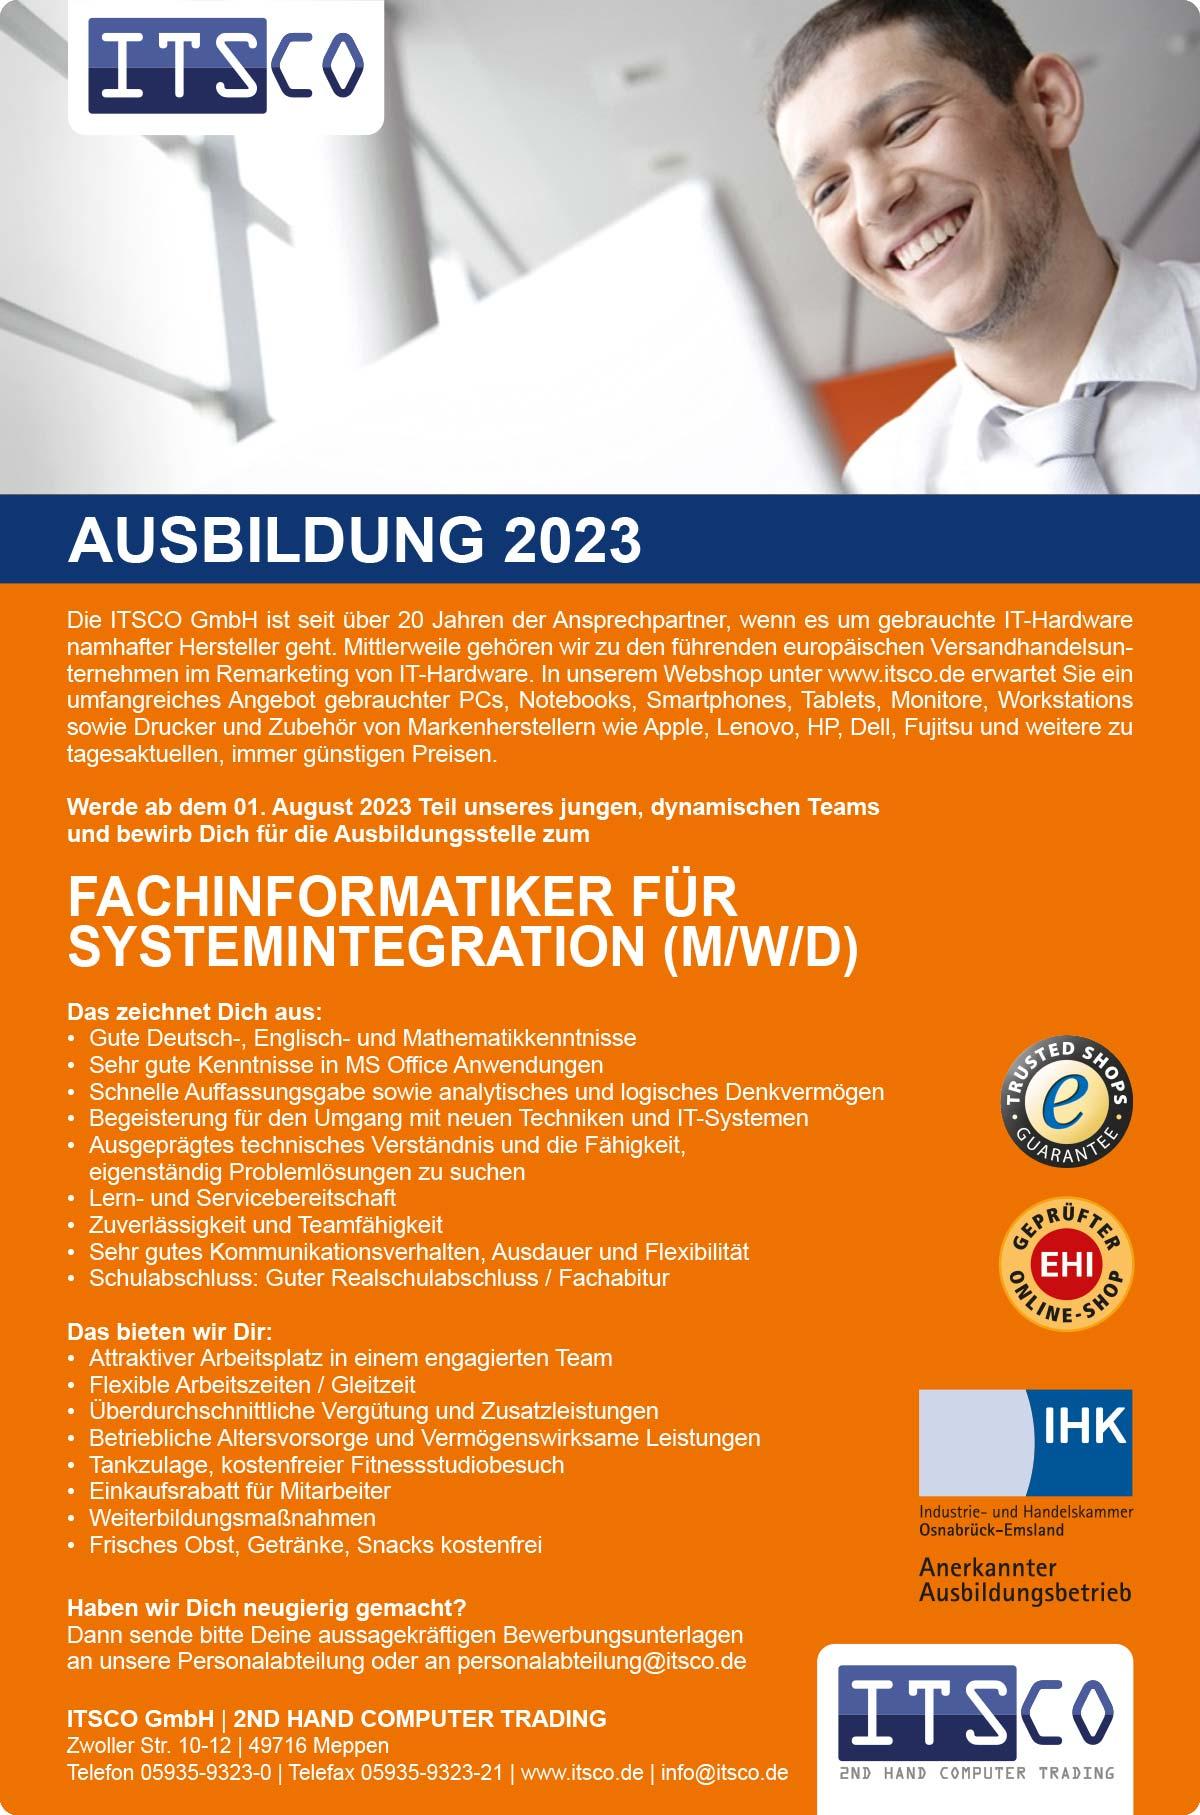 Ausbildung zum Fachinformatiker Systemintegration (m/w/d)